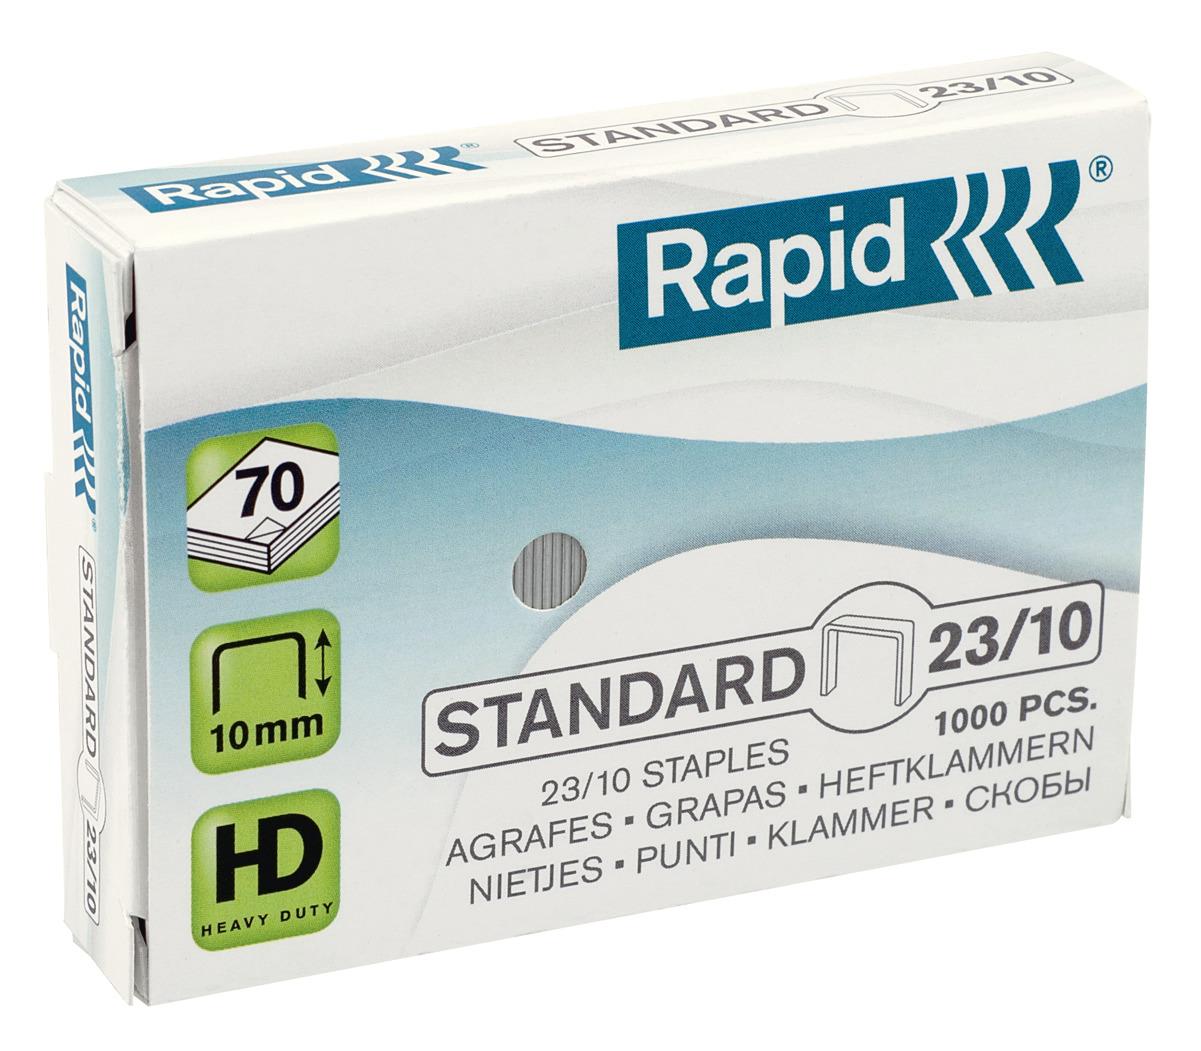 Rapid Standard Heftklammern 23/10, 24869300, 1.000 Stück